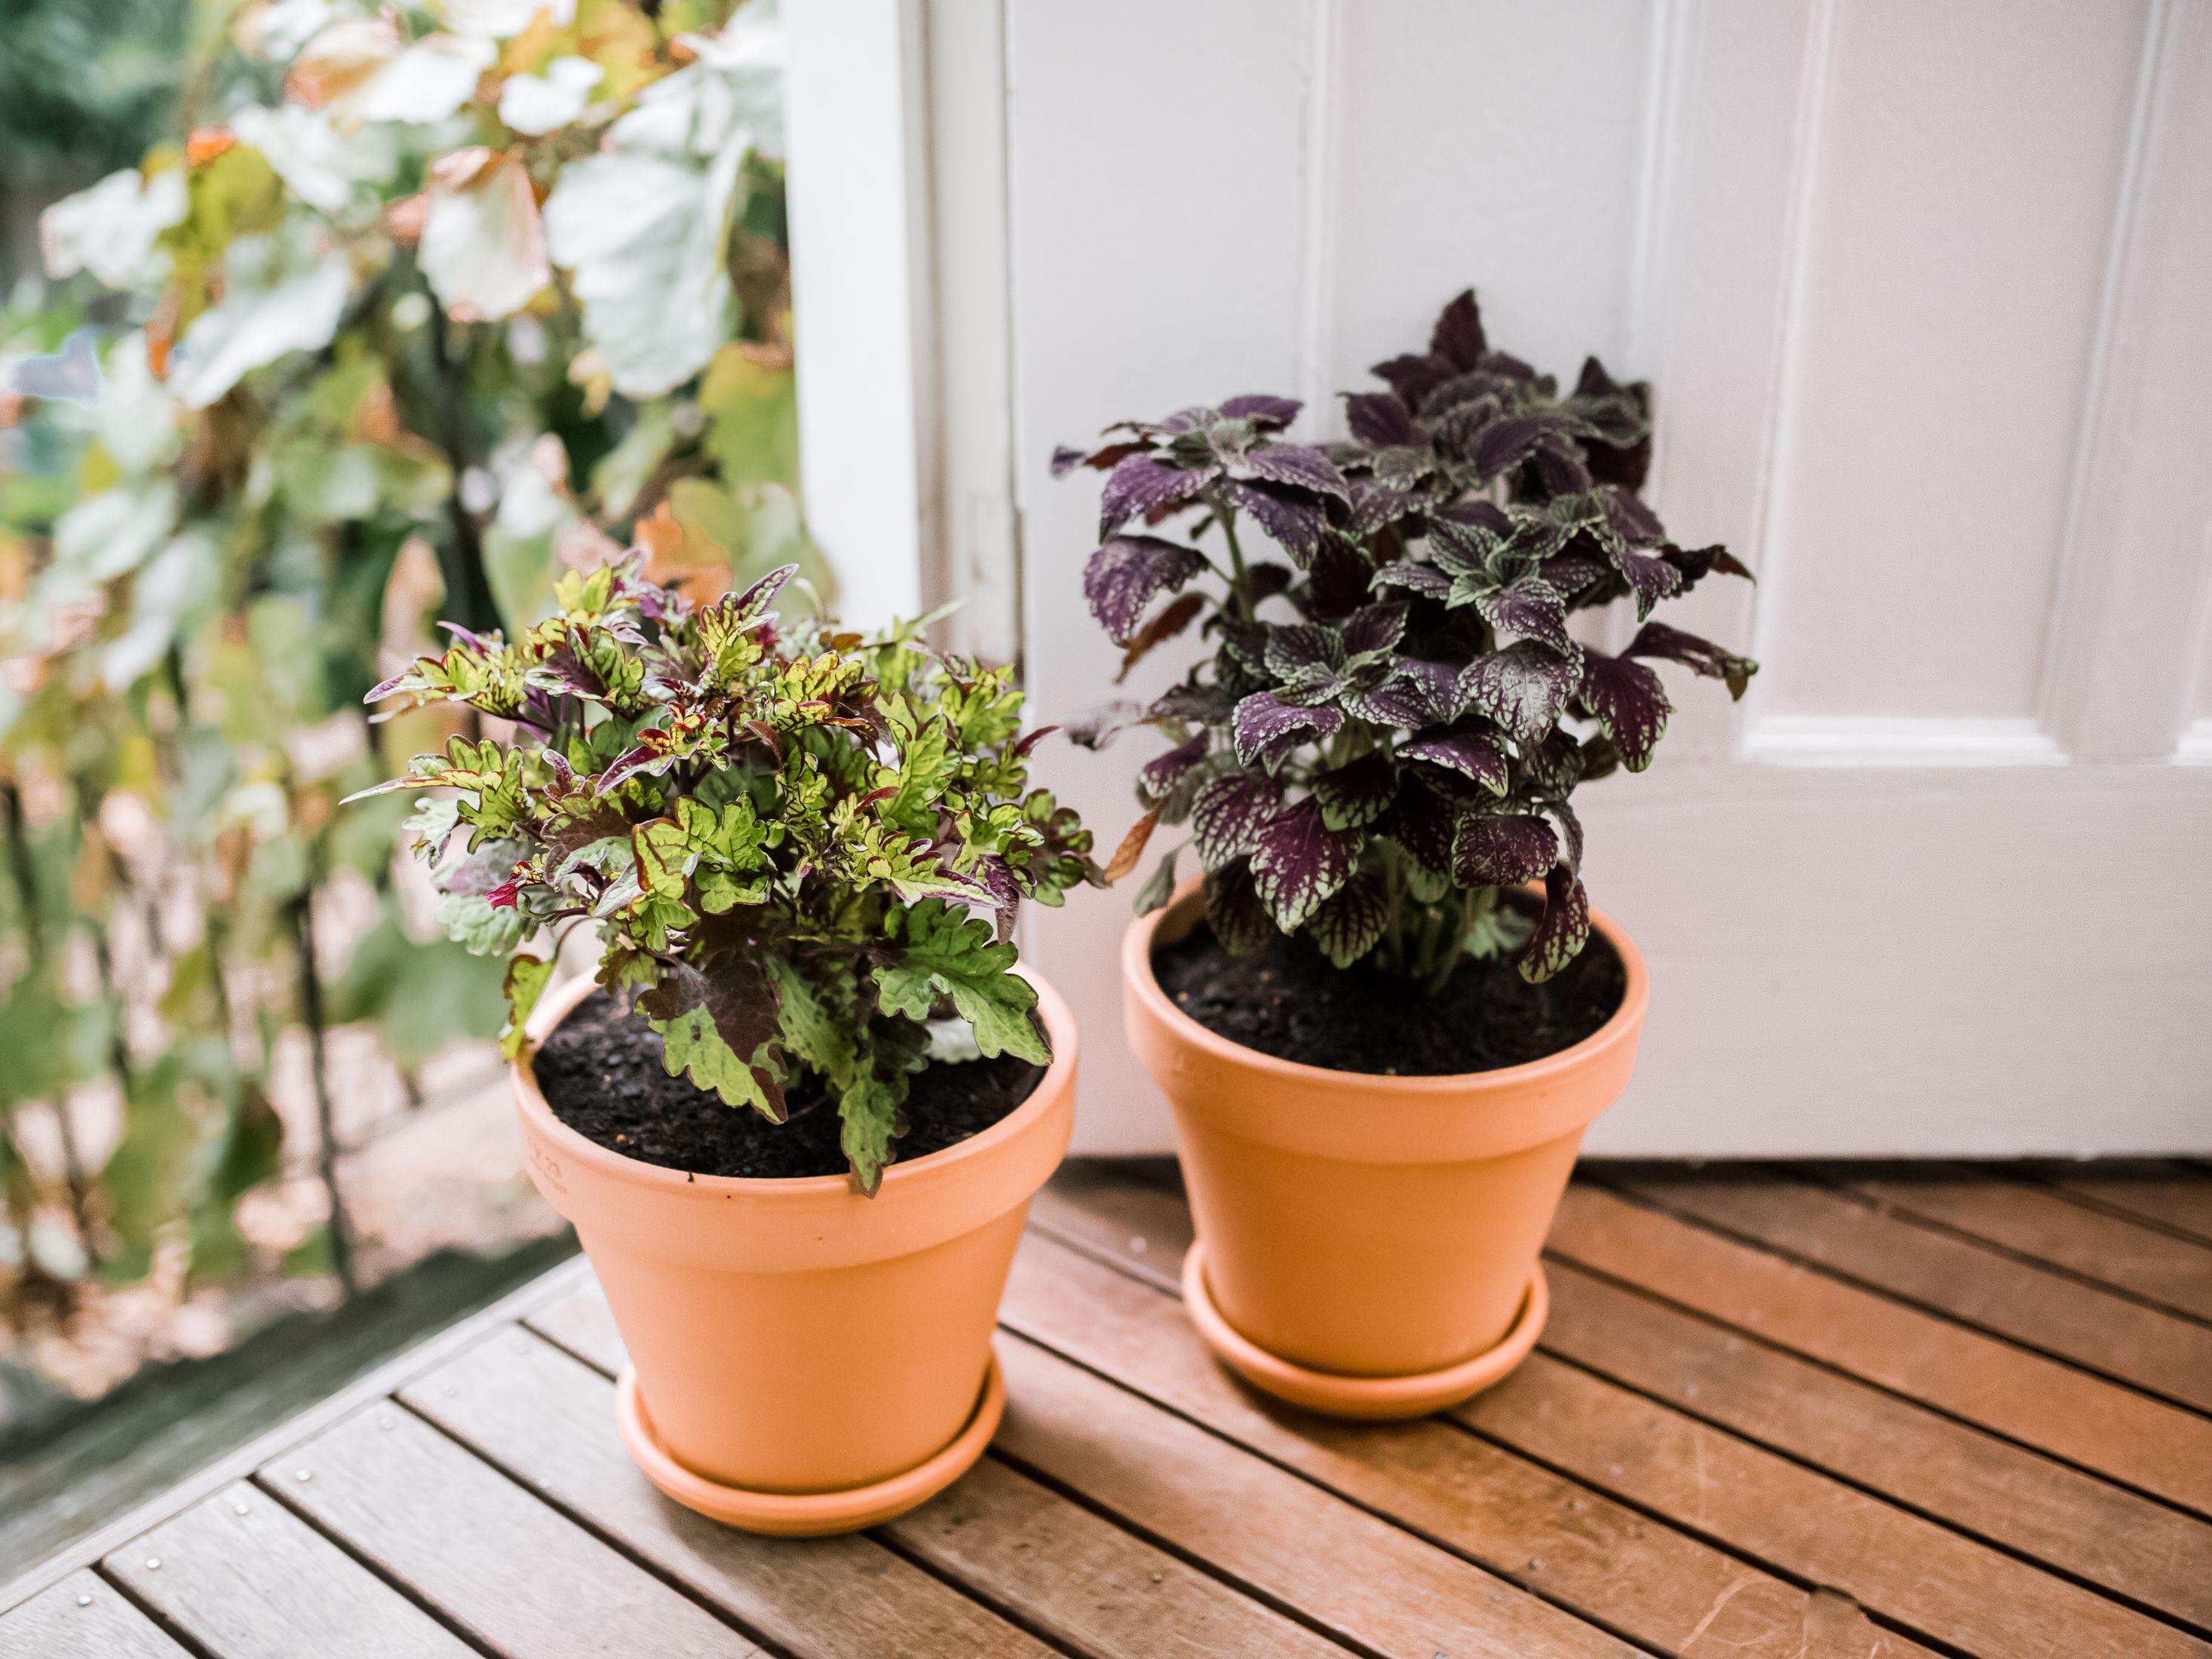 How To Grow Coleus Plants Indoors